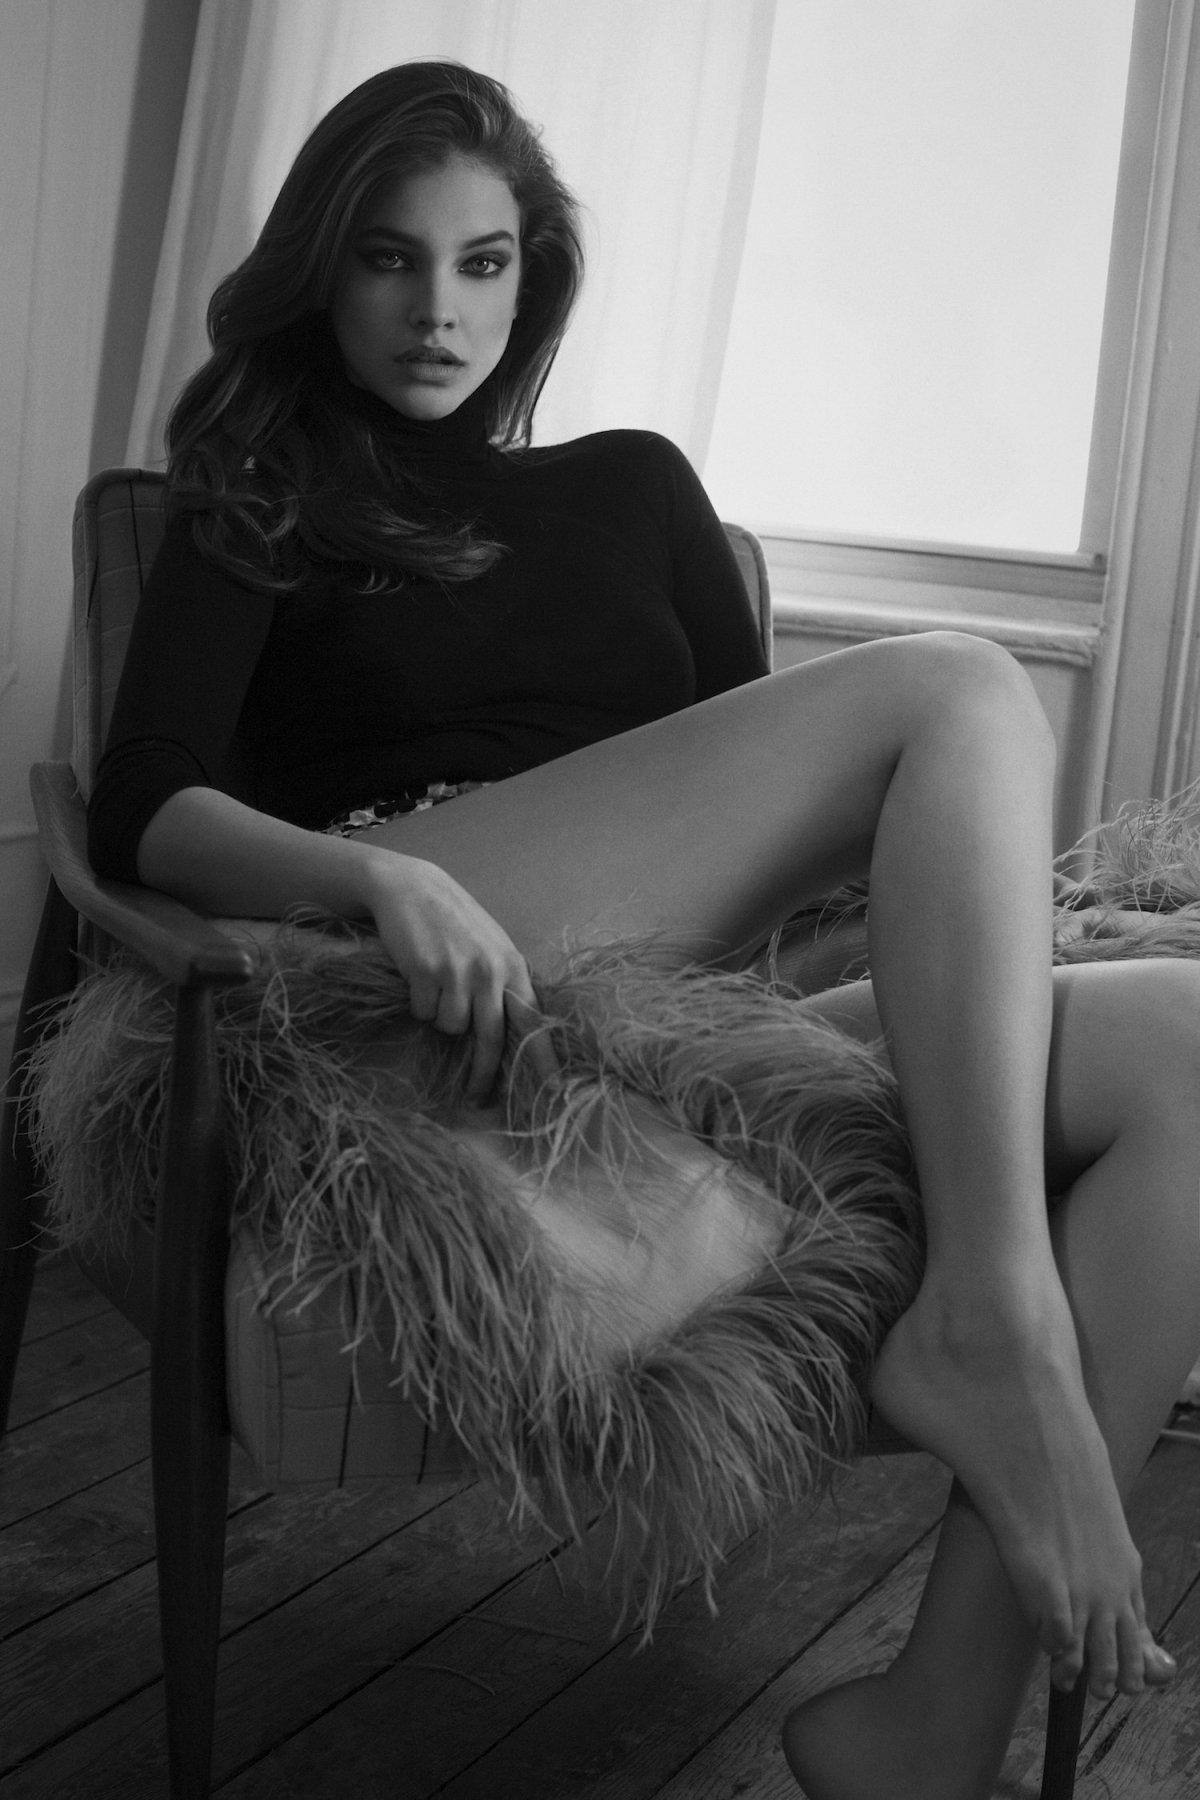 Barbara Palvin by Krisztian Eder for CR Fashion Book